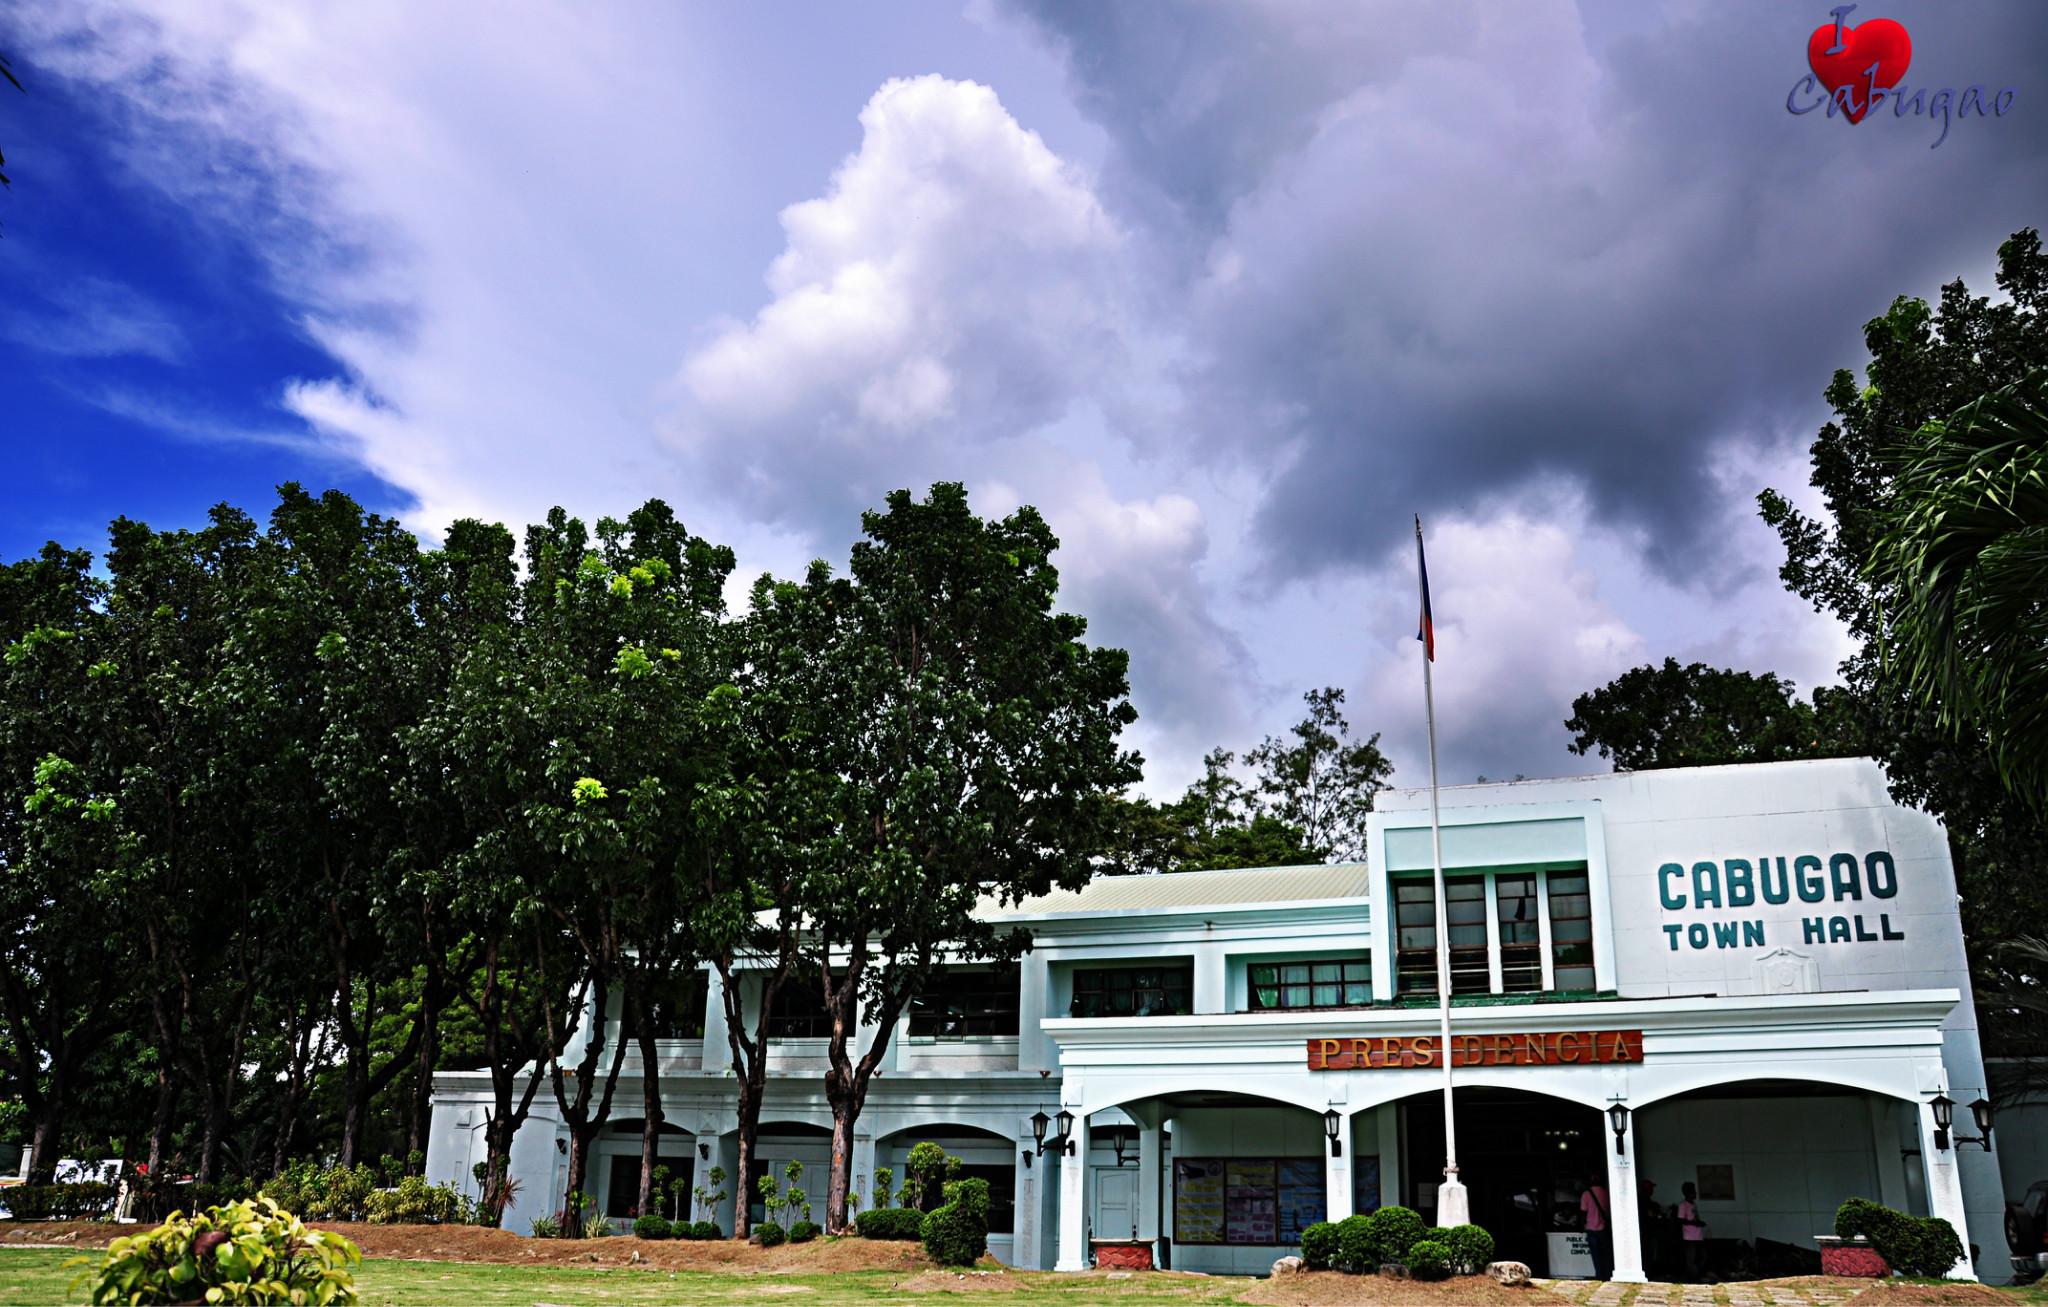 Photo: Cabugao Town Hall